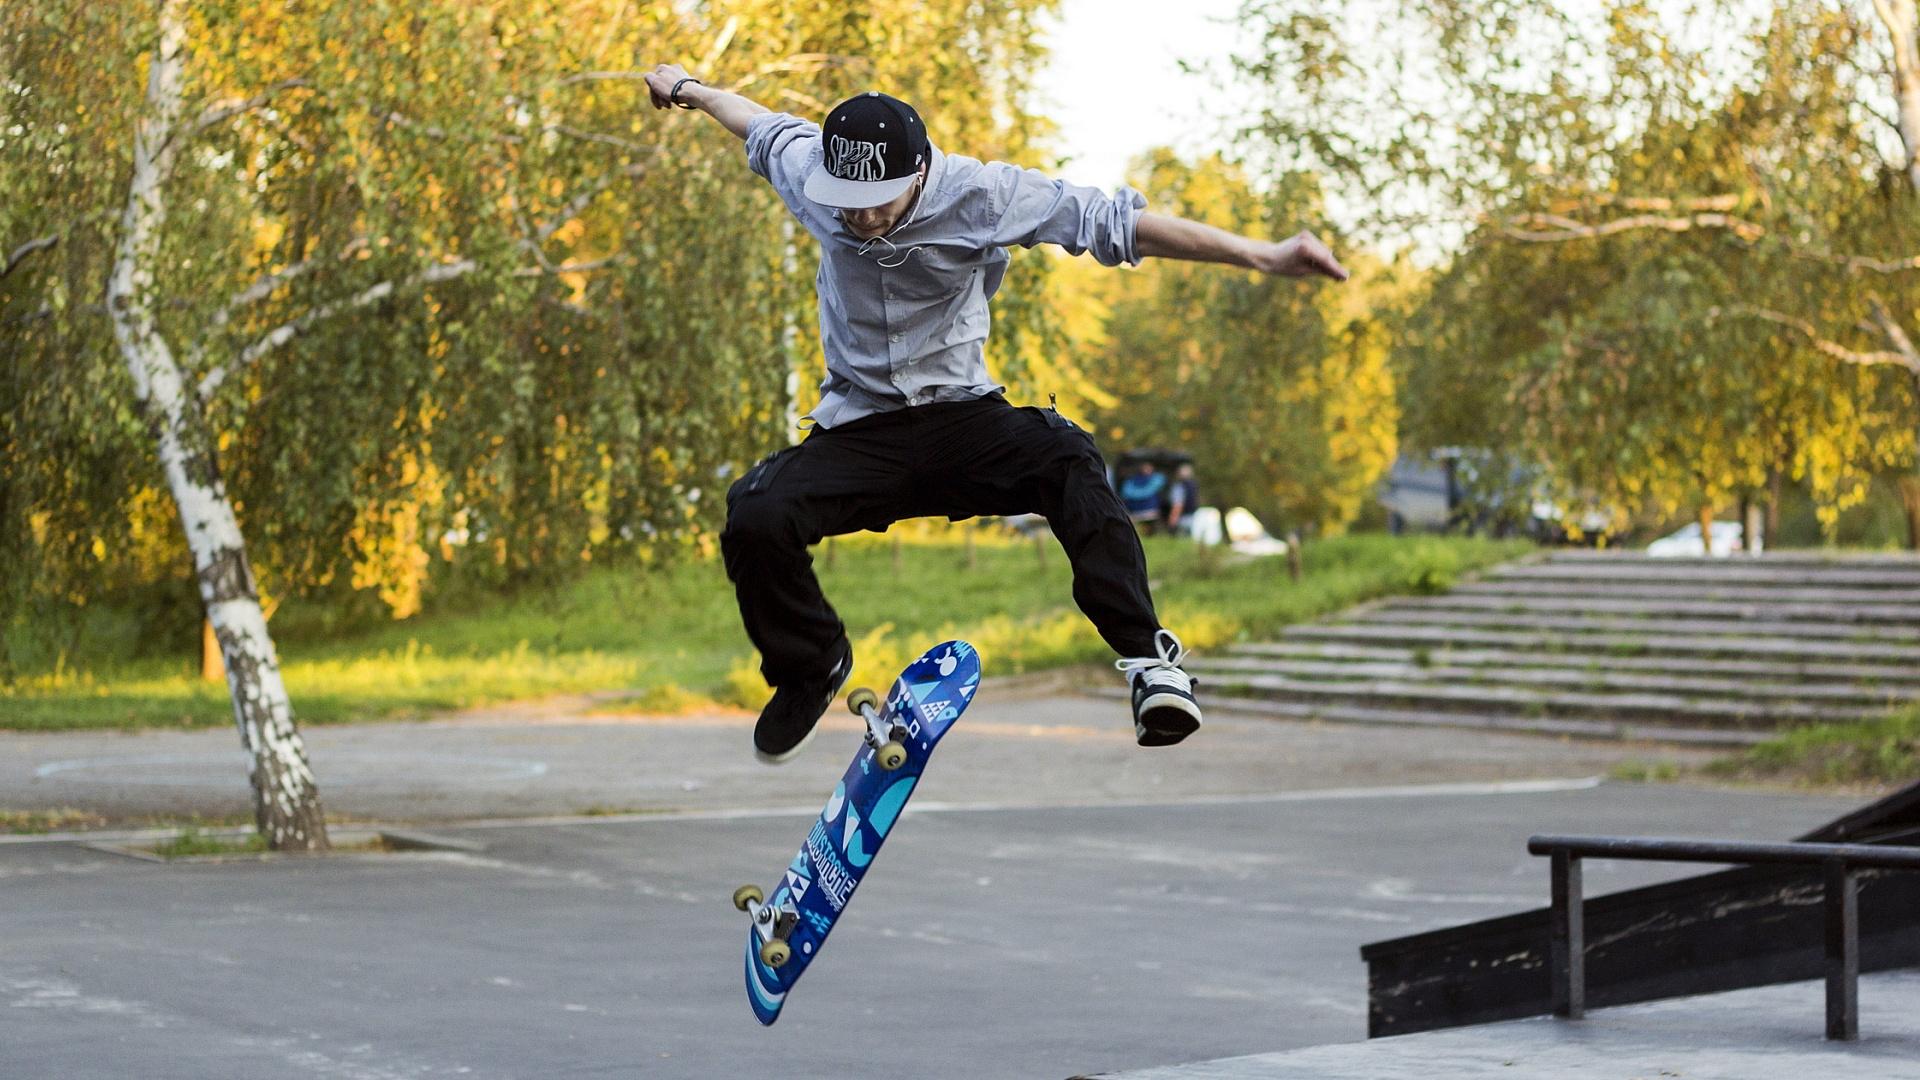 Cool Skateboard Wallpaper Desktop h777242 Sports HD Wallpaper 1920x1080